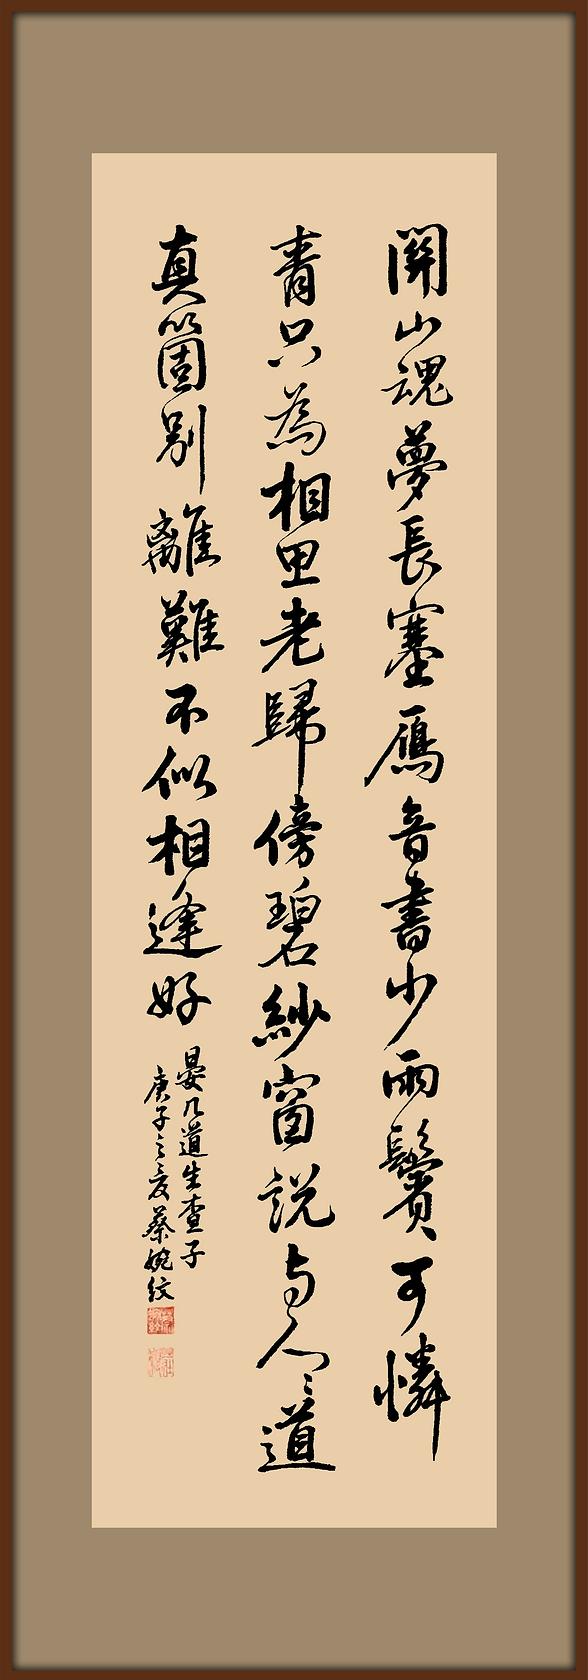 021-蔡婉紋.png